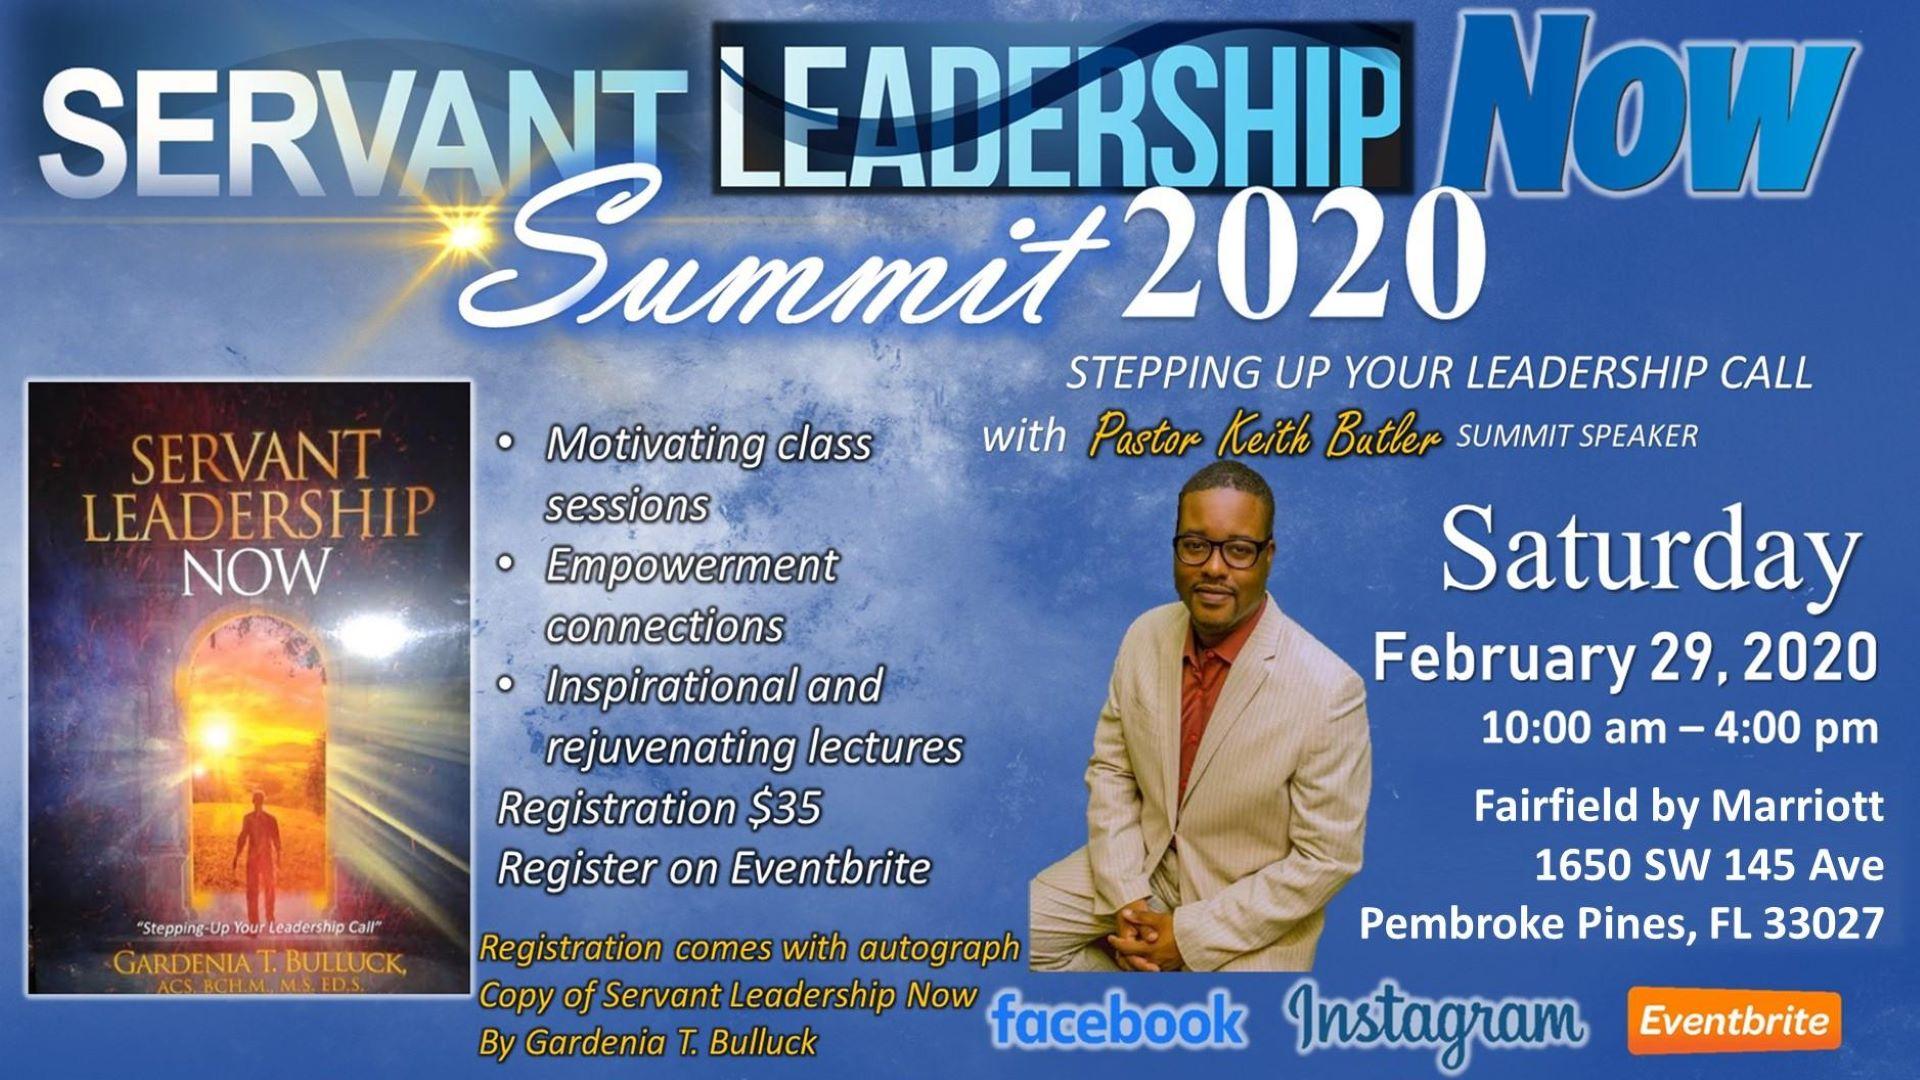 Servant Leadership NOW Summit 2020 Event